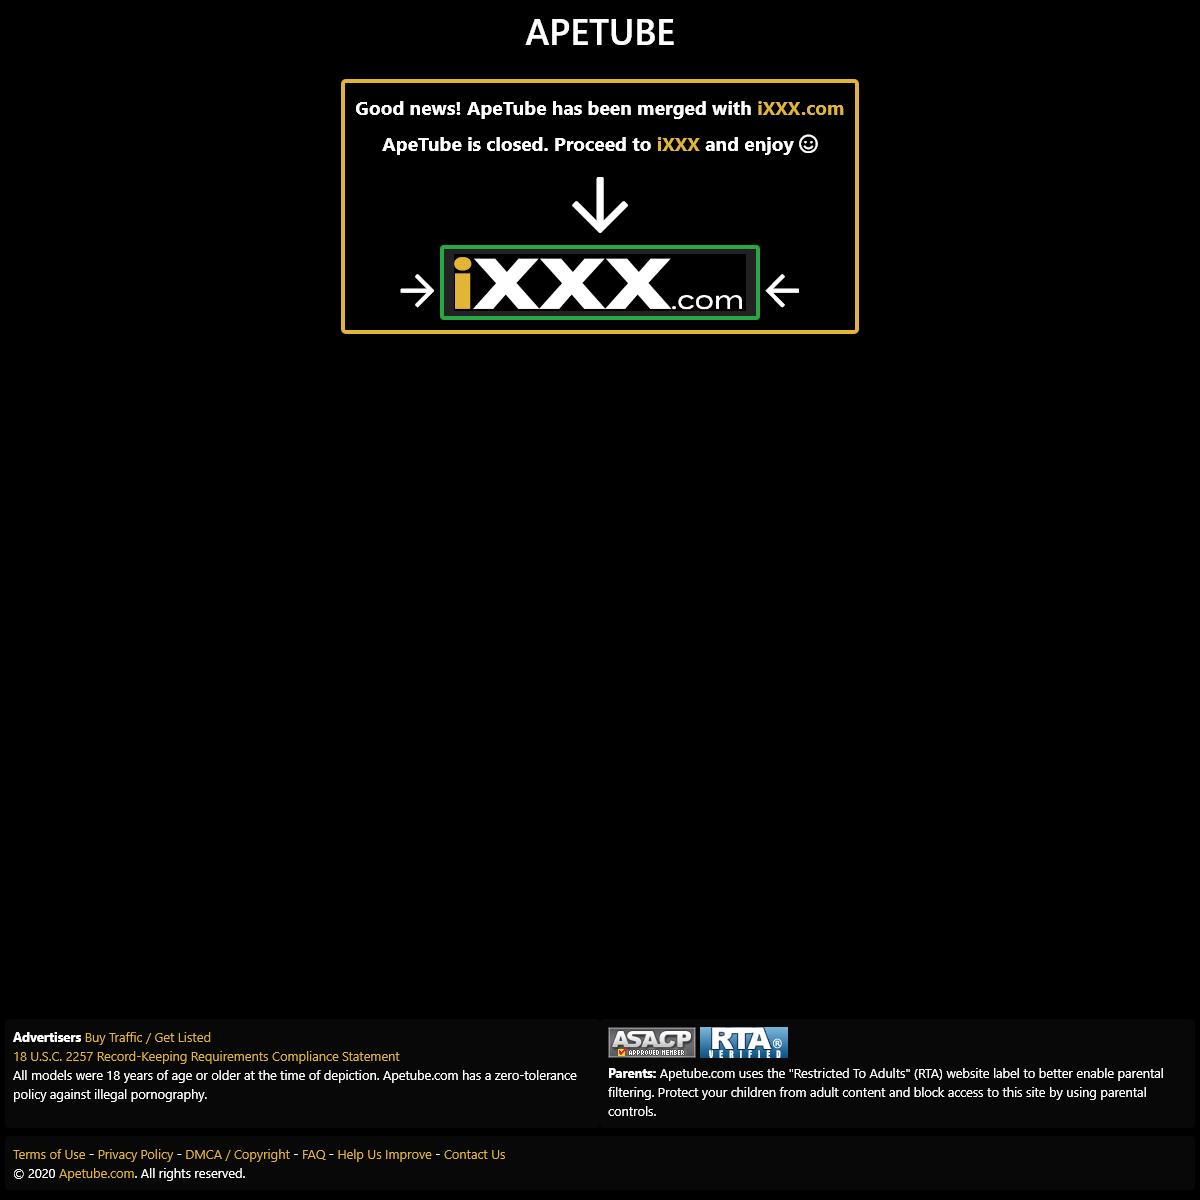 A complete backup of apetube.com